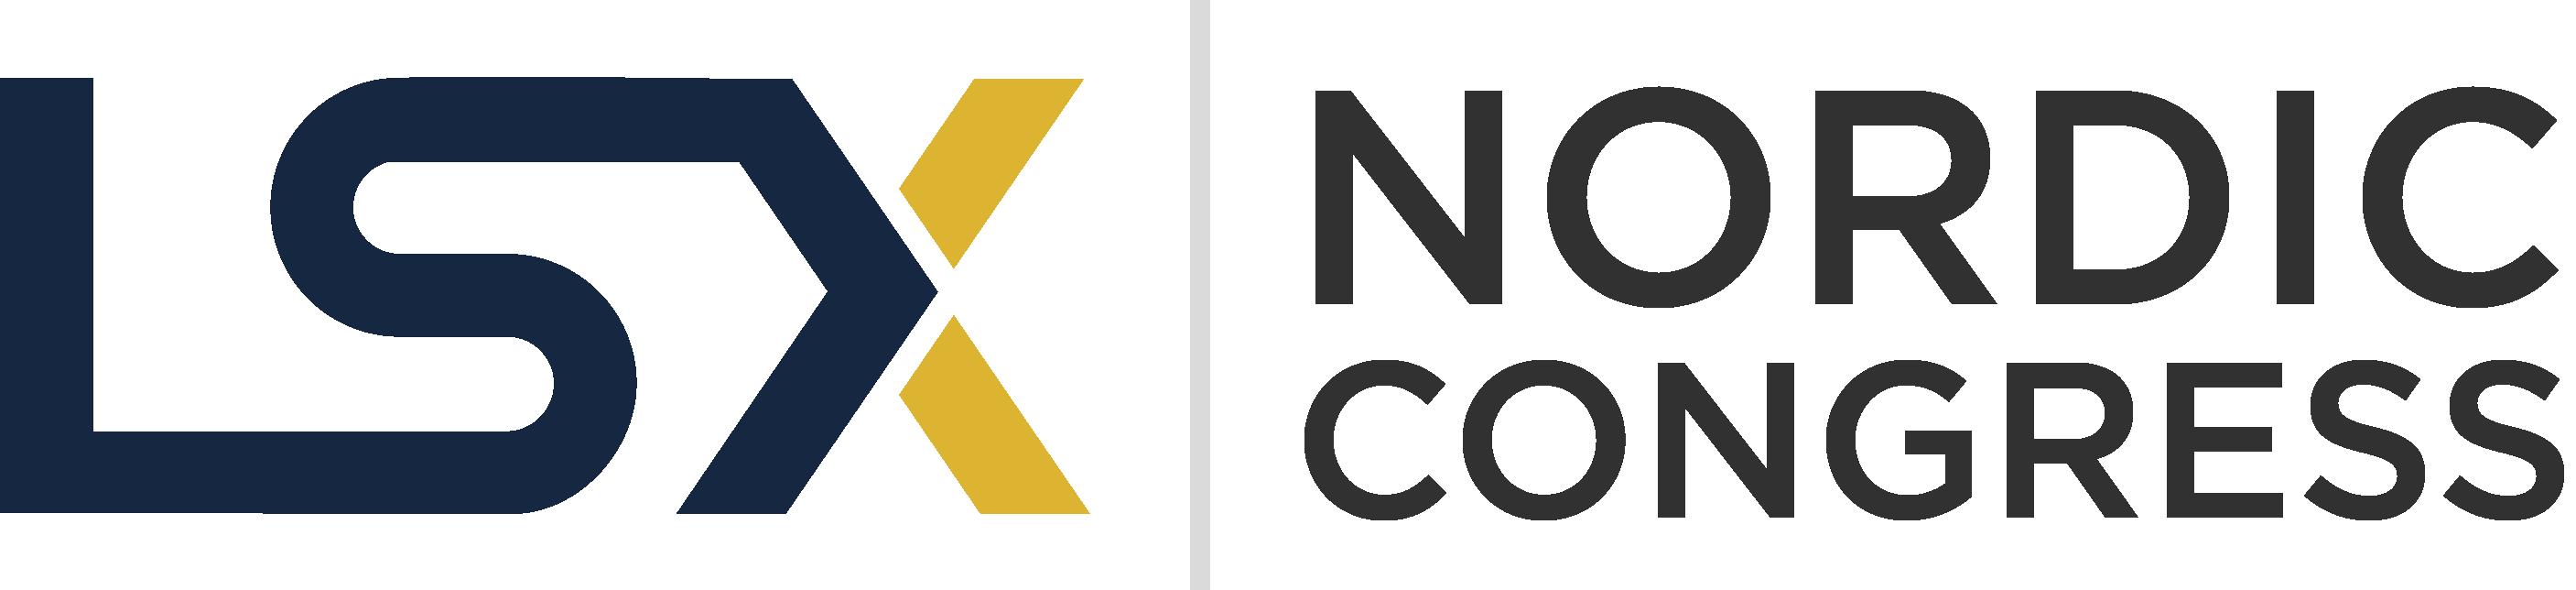 LSX Nordic Congress-1.png